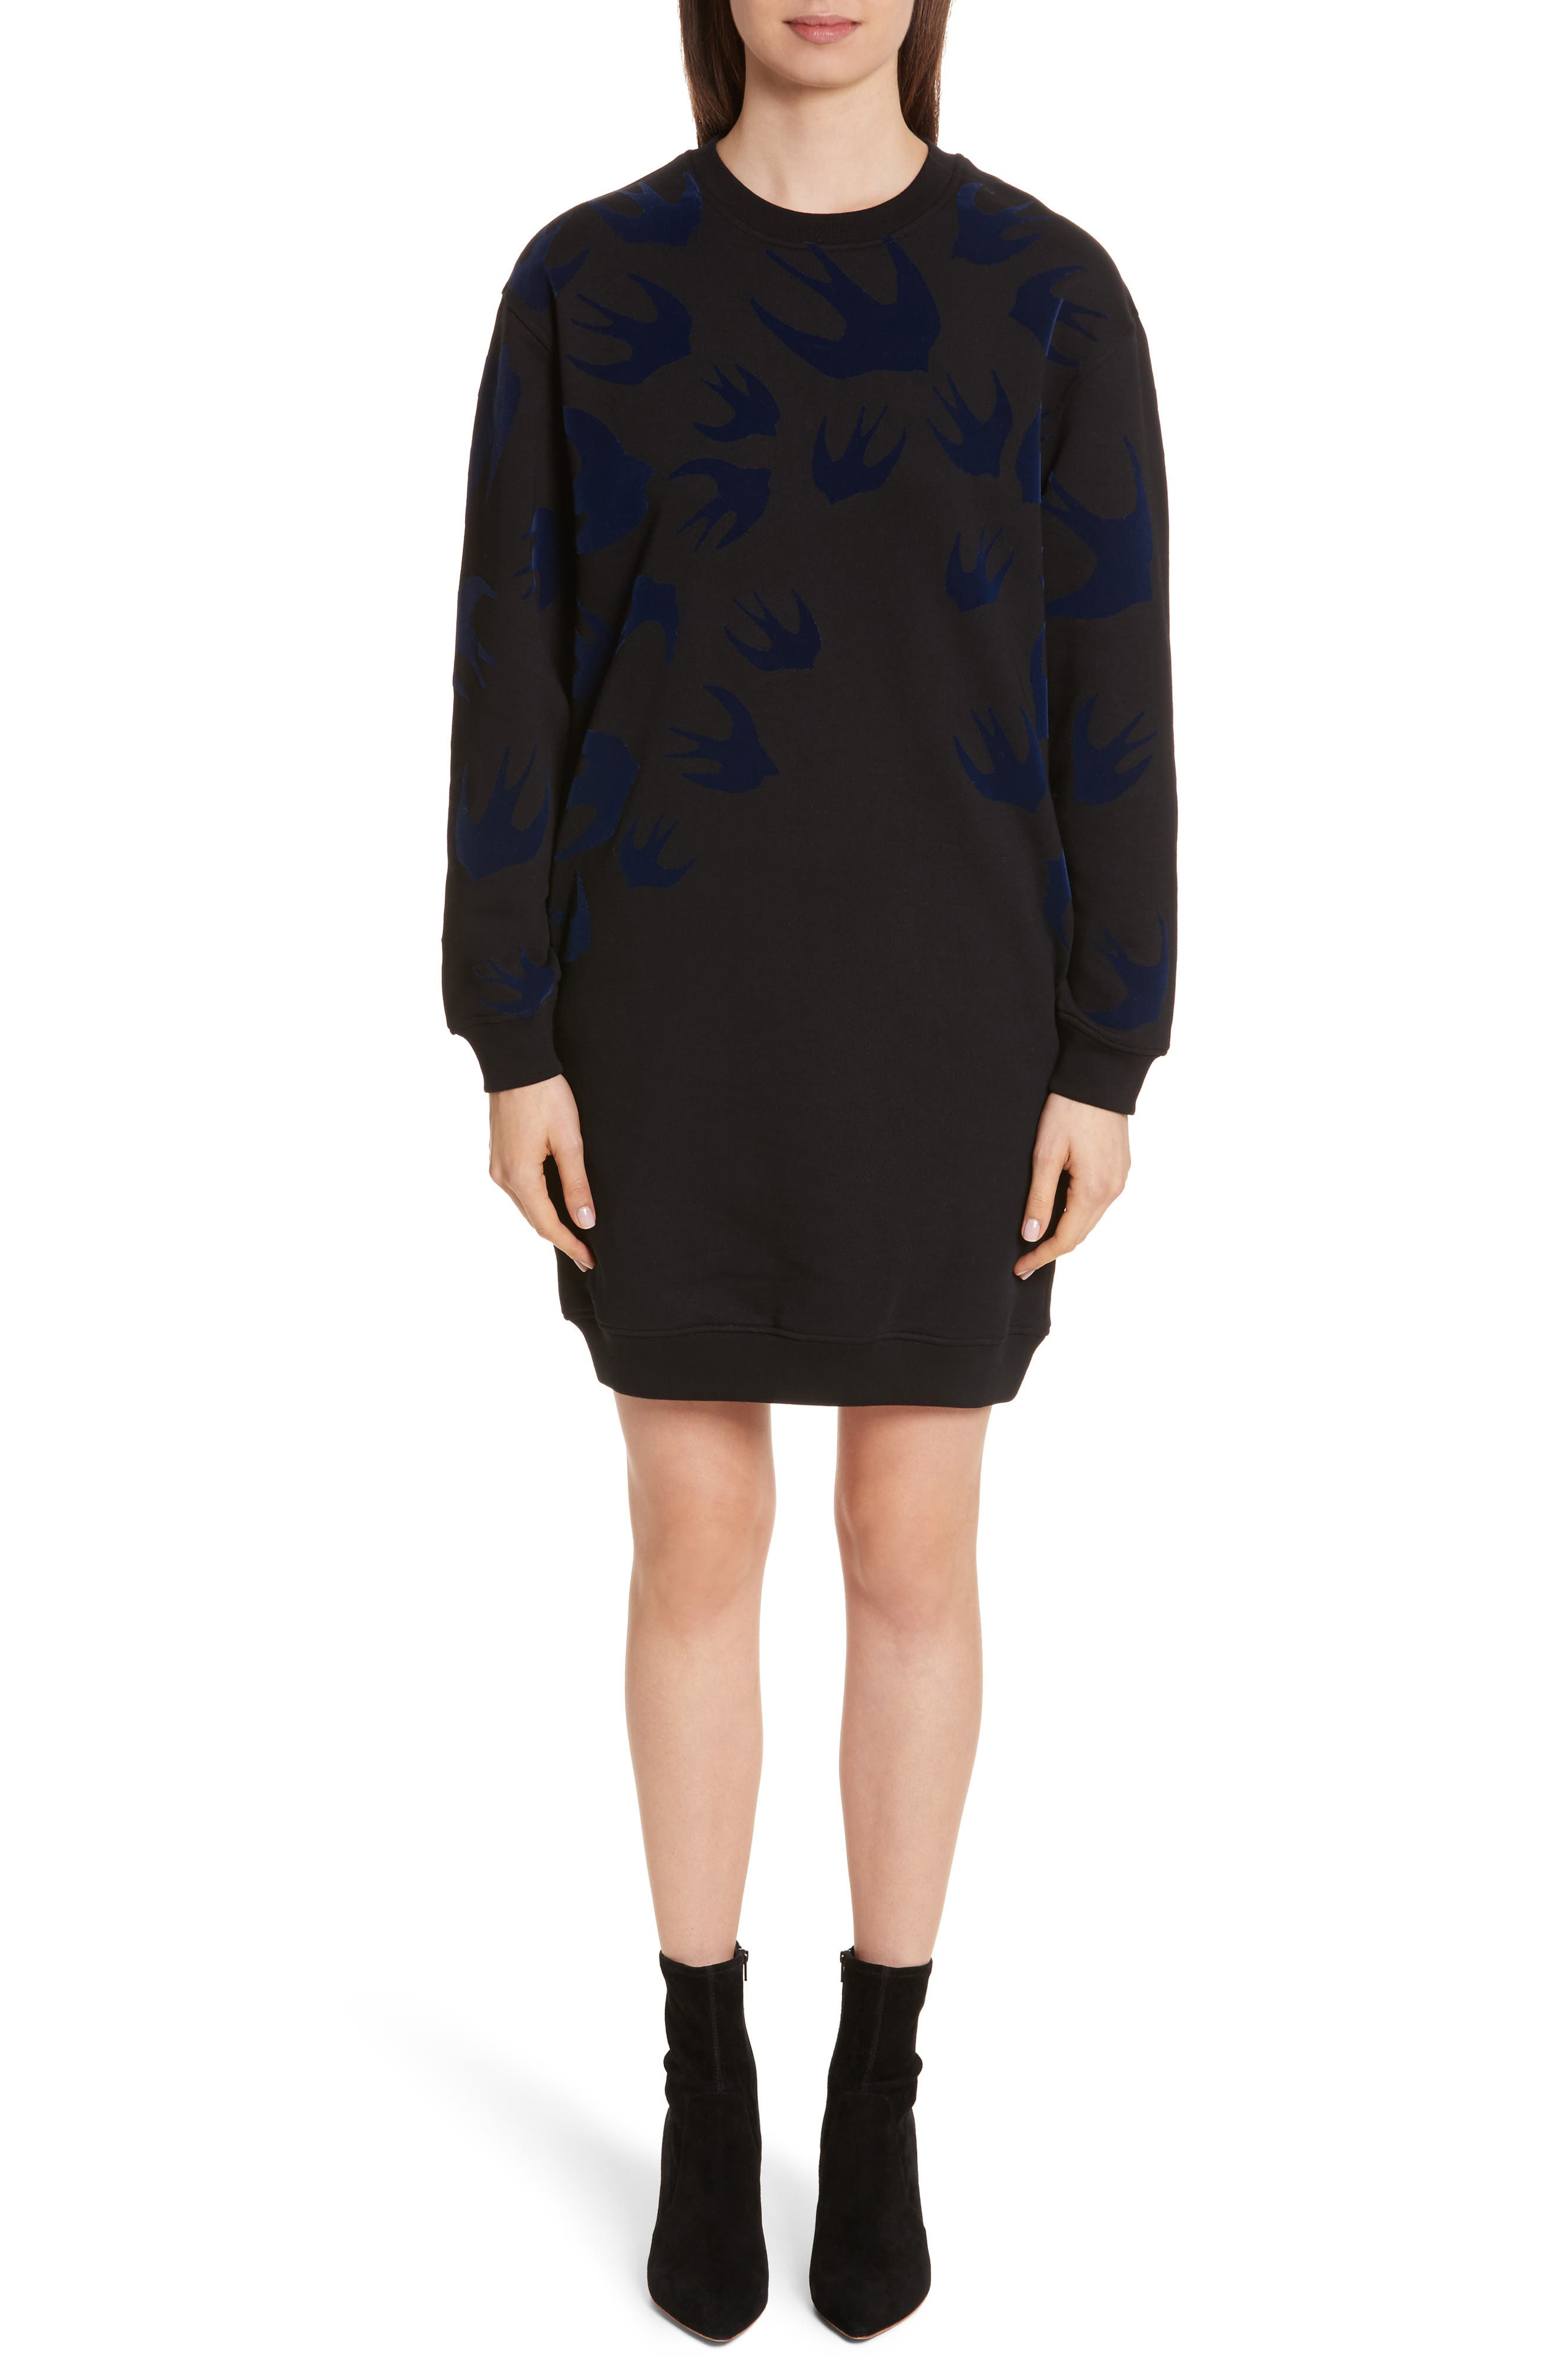 Main Image - McQ Alexander McQueen Swallow Classic Sweatshirt Dress